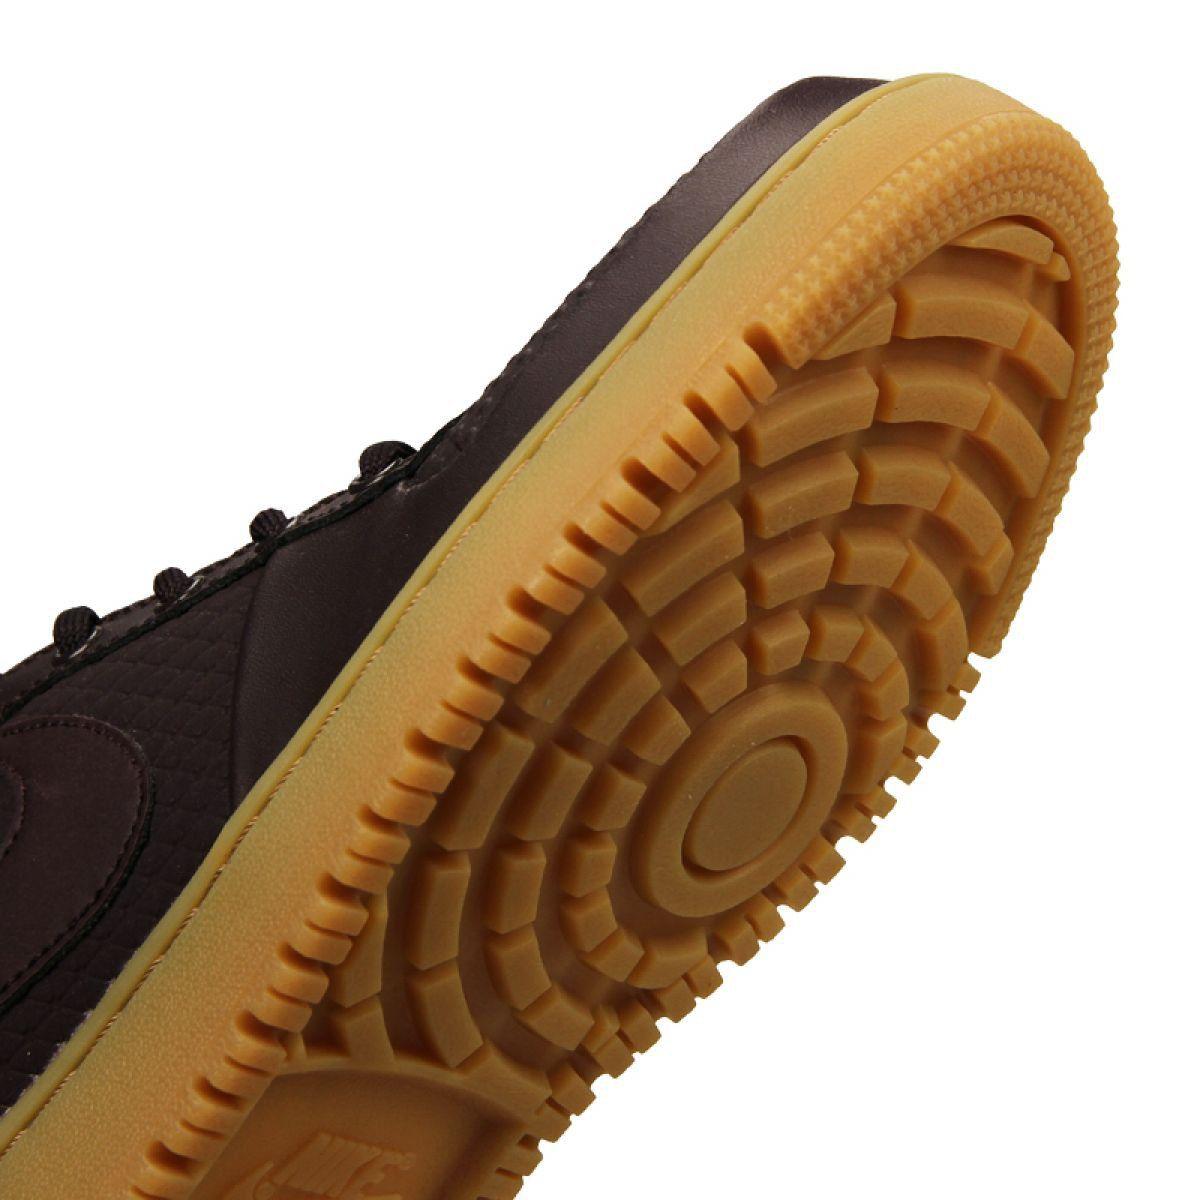 Nike Ebernon Mid Winter M AQ8754-600